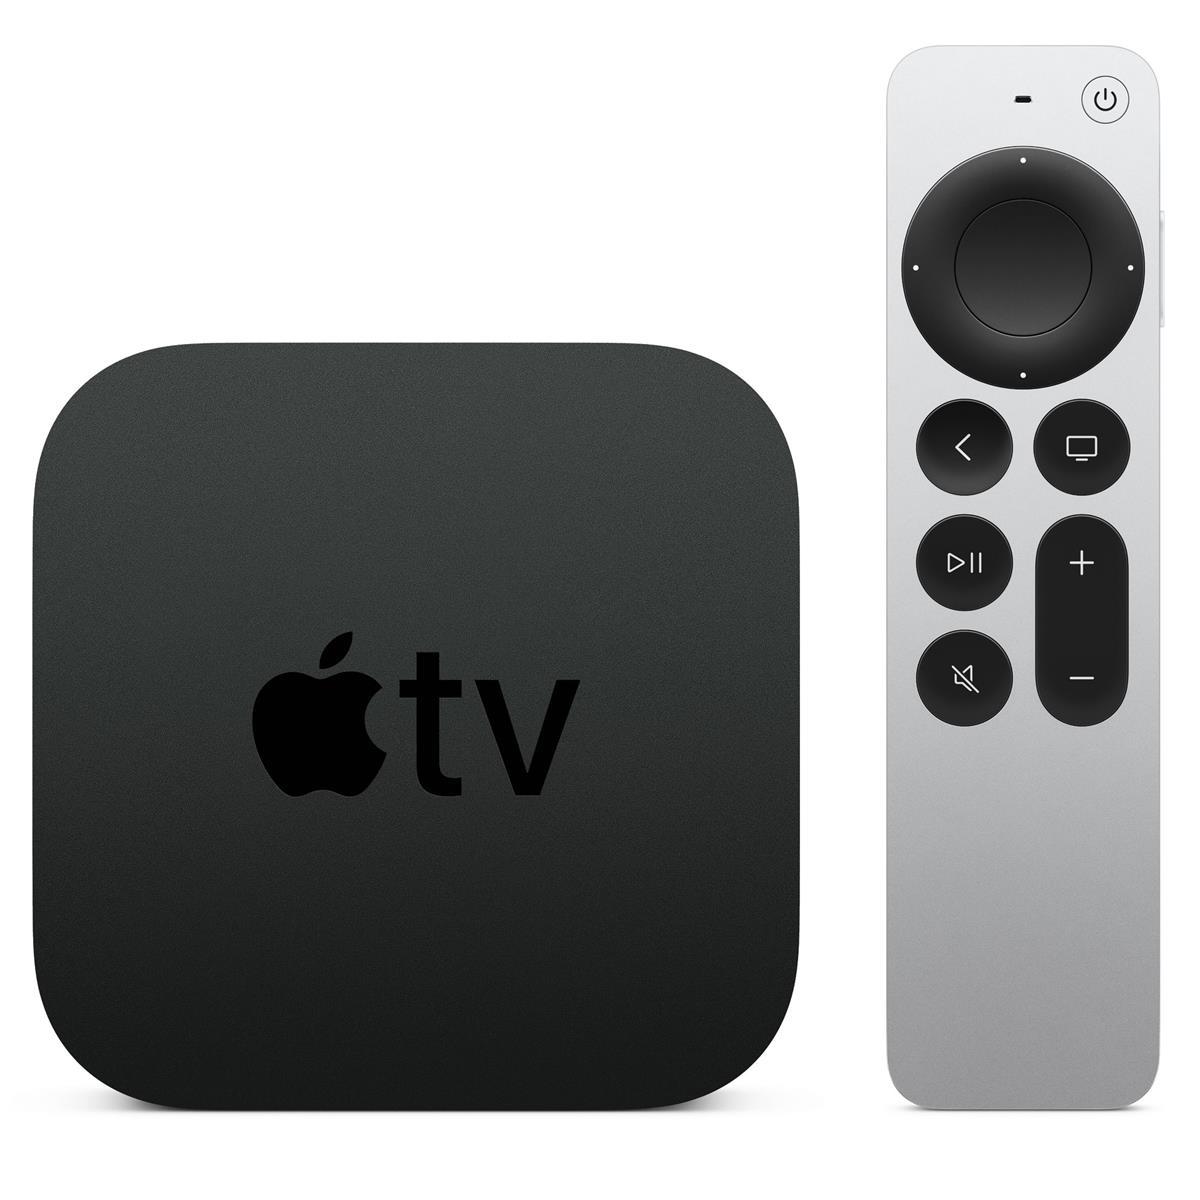 32GB Apple TV 4K (Latest Gen 2021) $159 + free s/h at Adorama